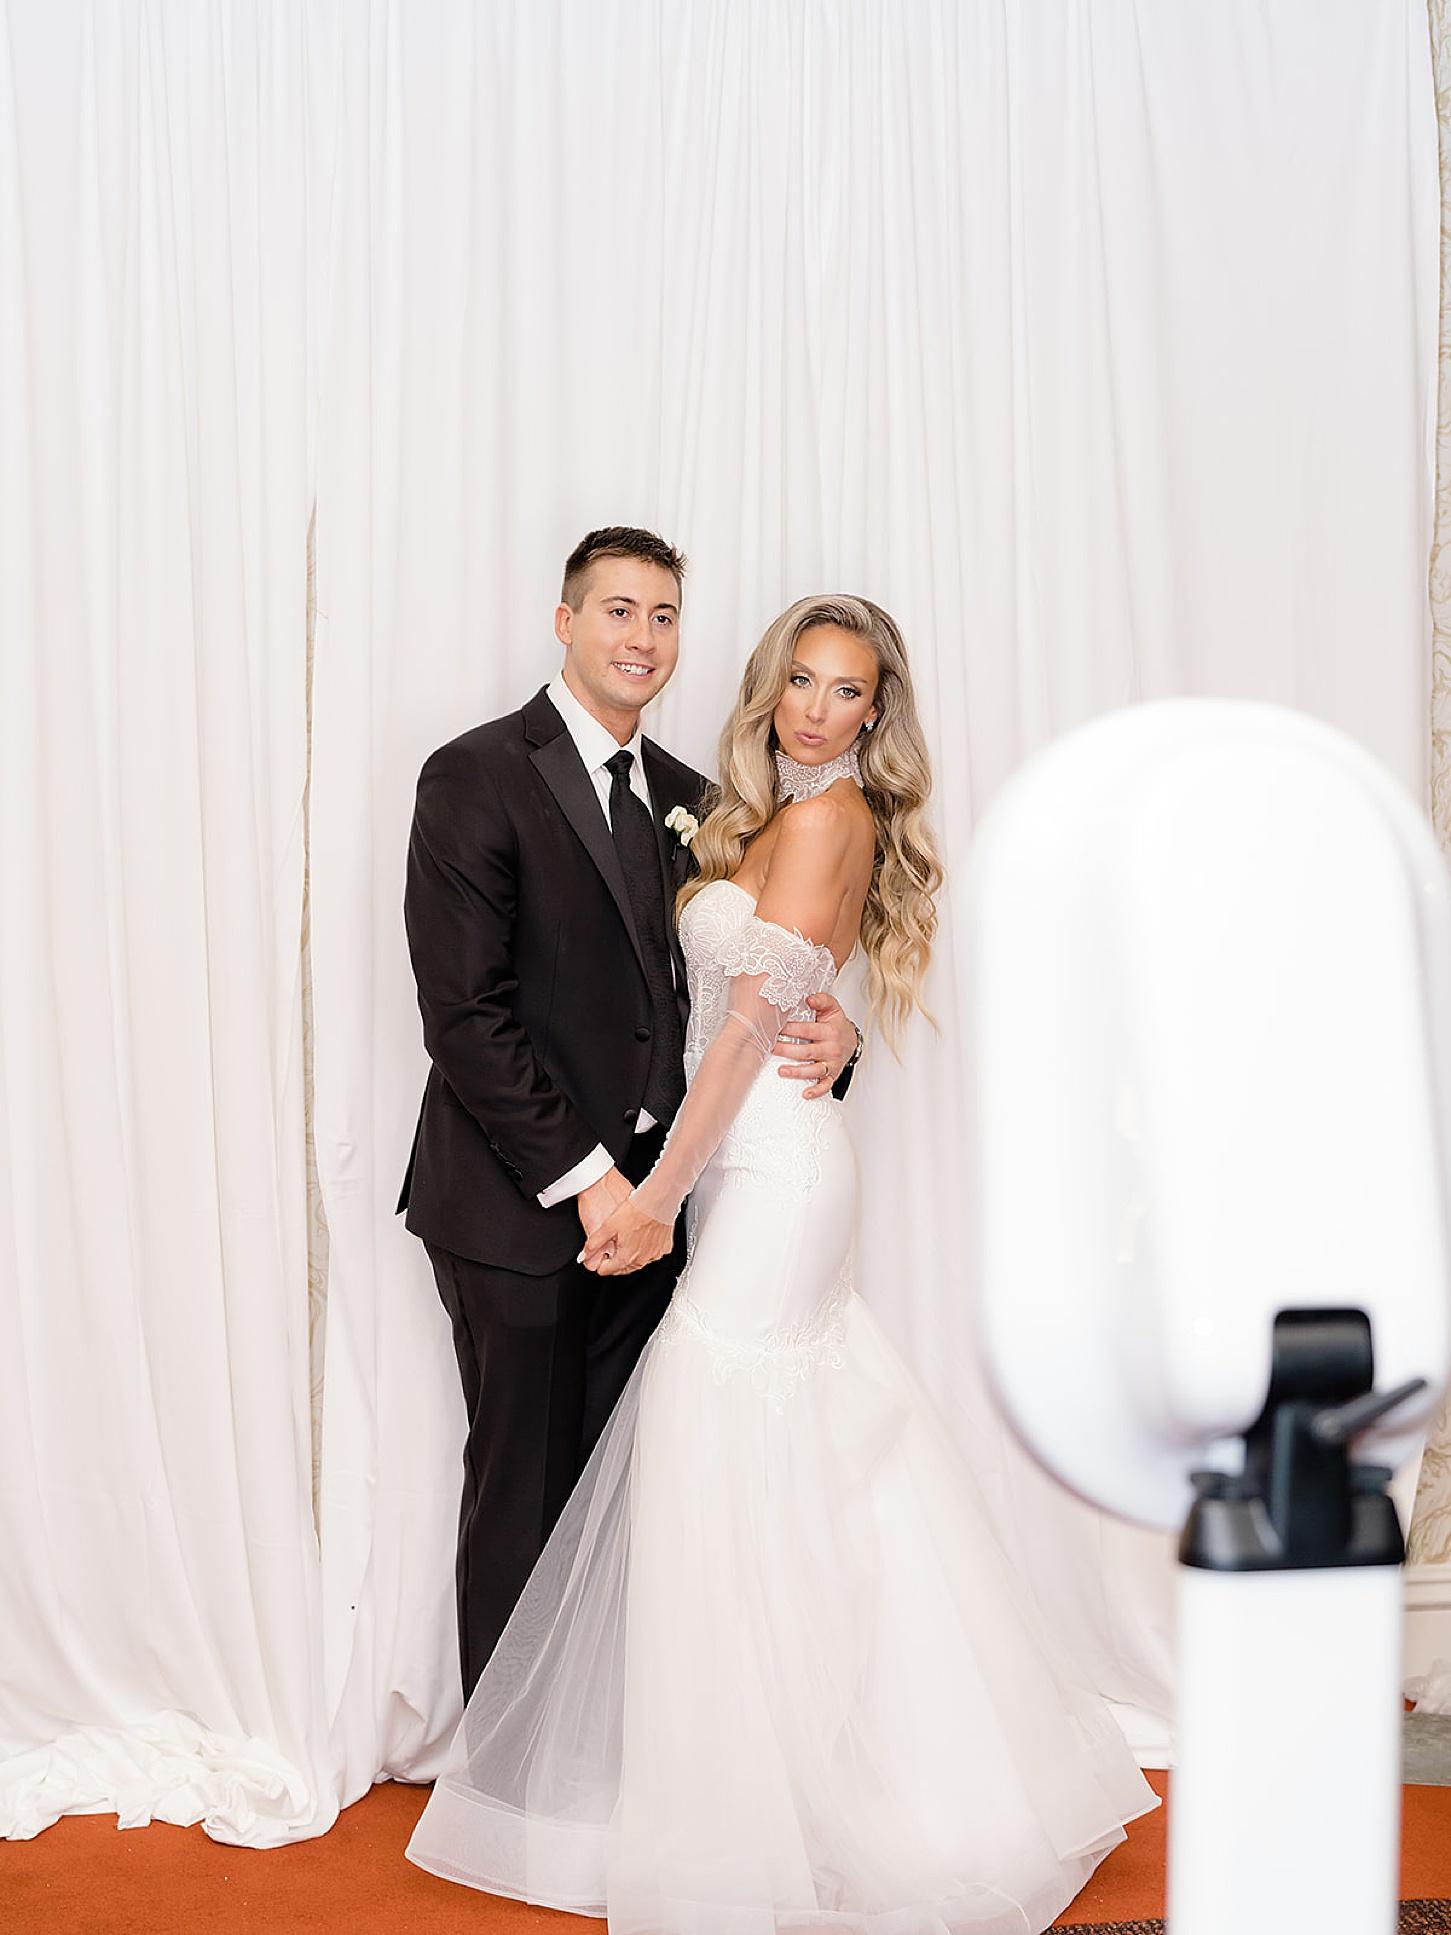 Atlantic City Wedding Photography Studio by Magdalena Studios Lexy Cha 0097